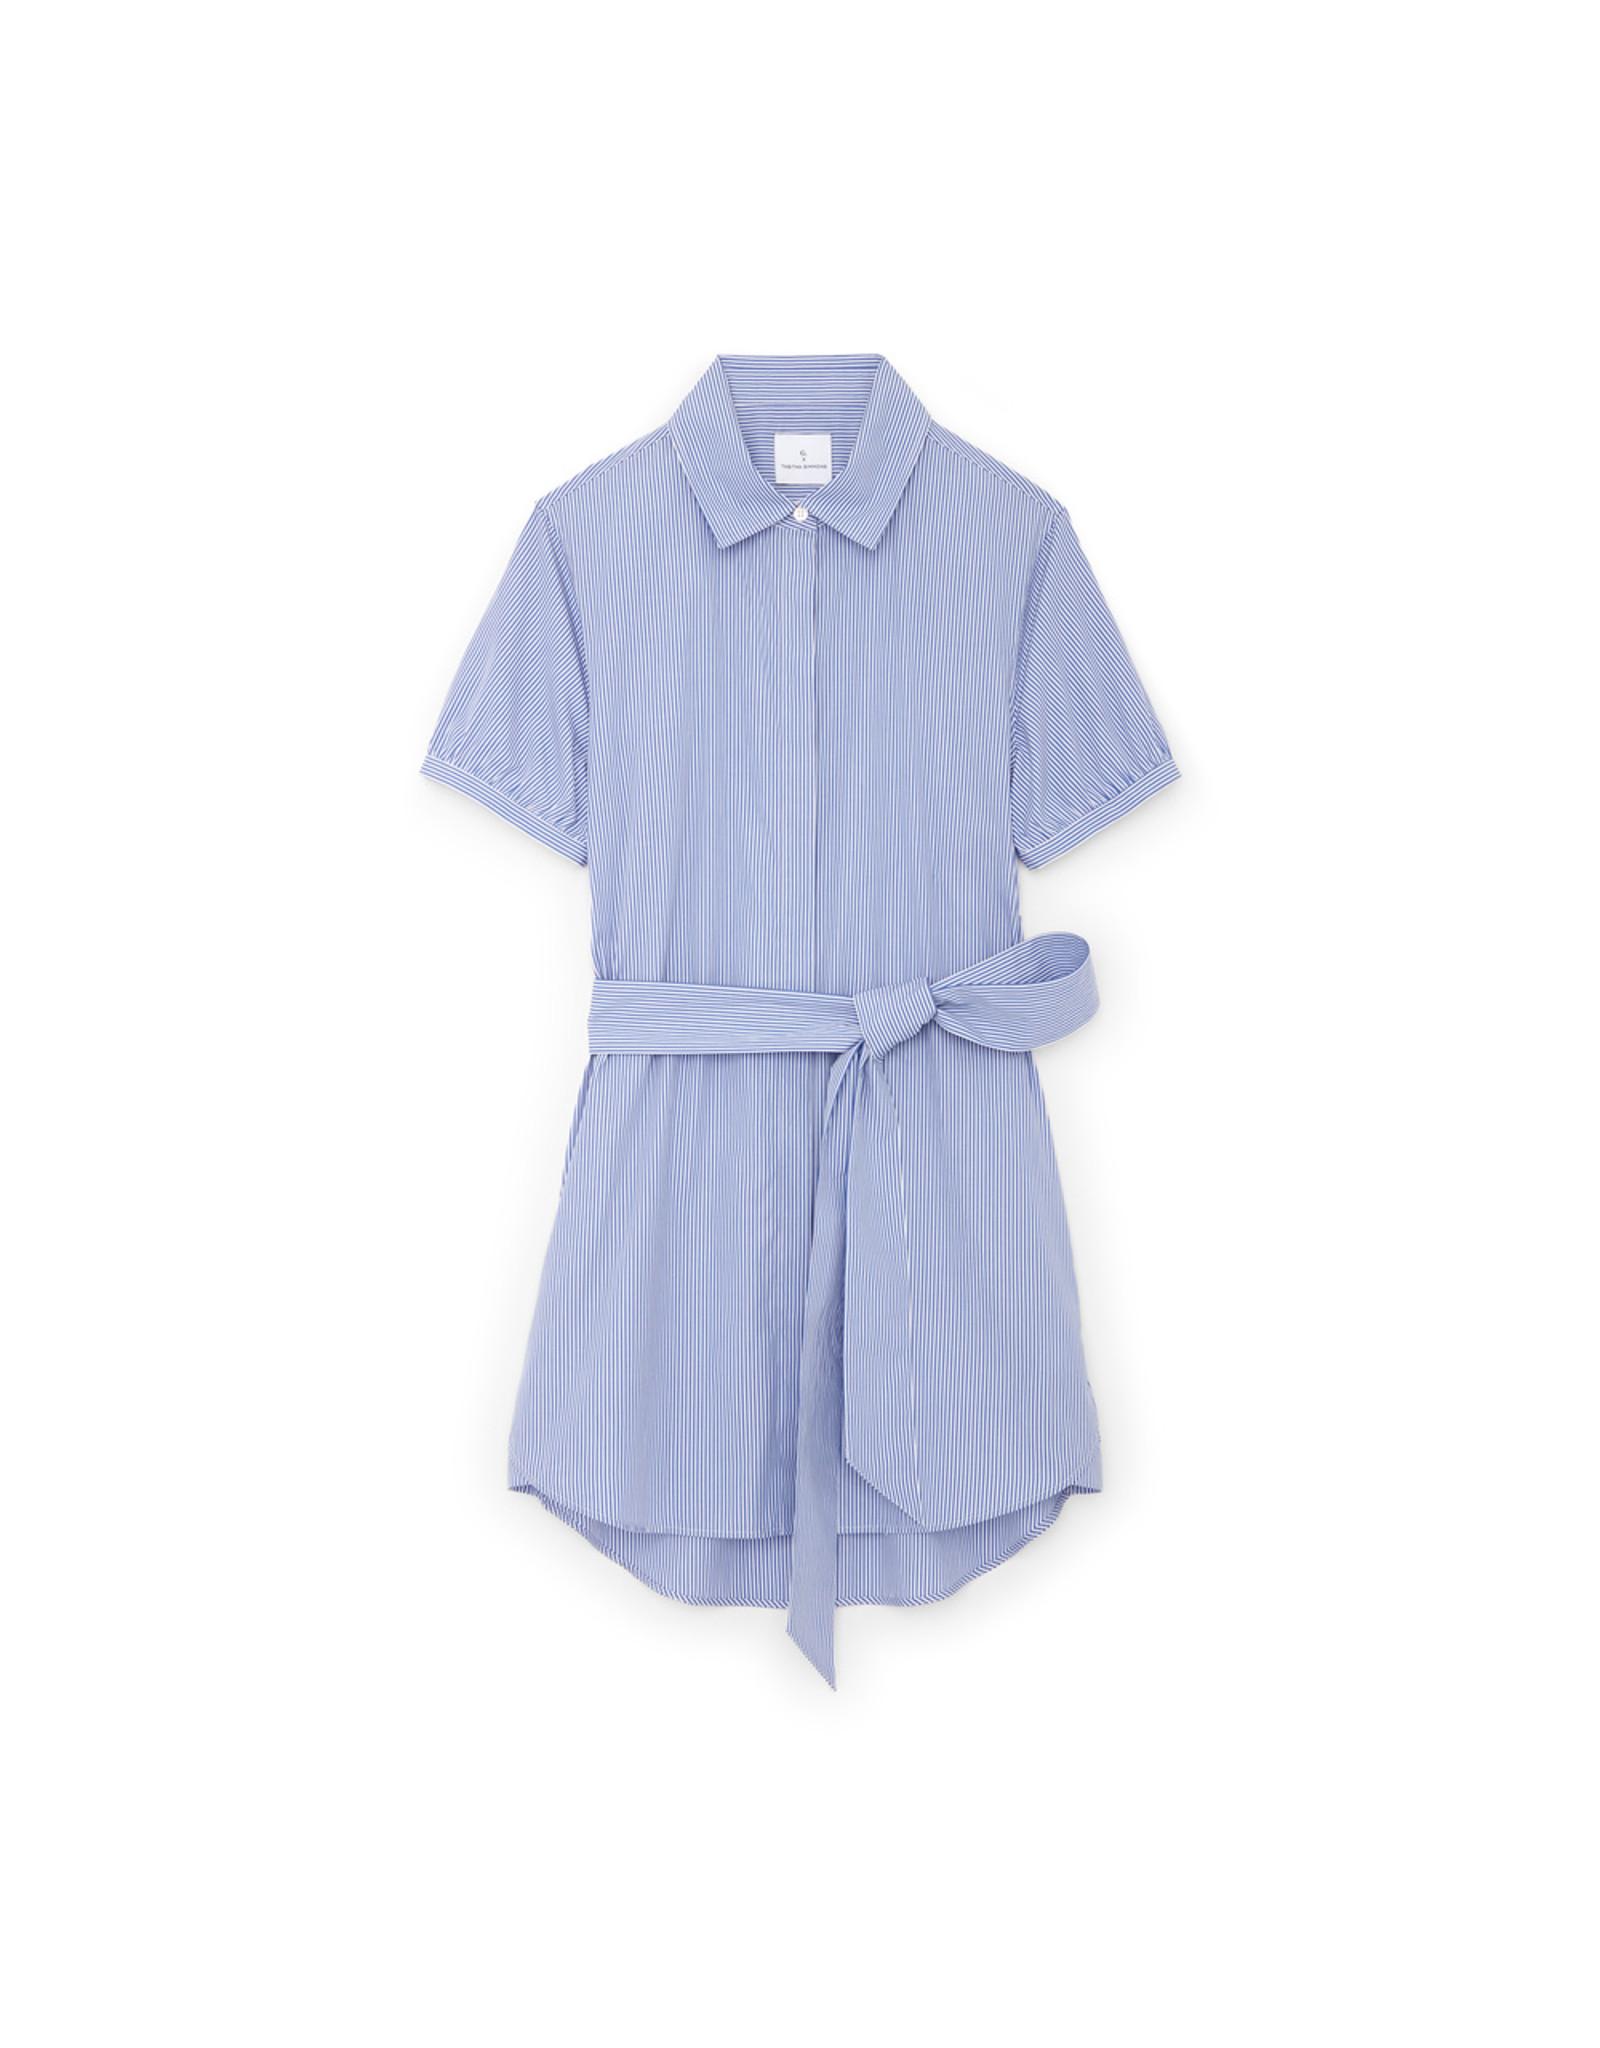 G. Label G. Label Cusco Mini Shirt Dress (color: Blue & White Stripe, Size: L)